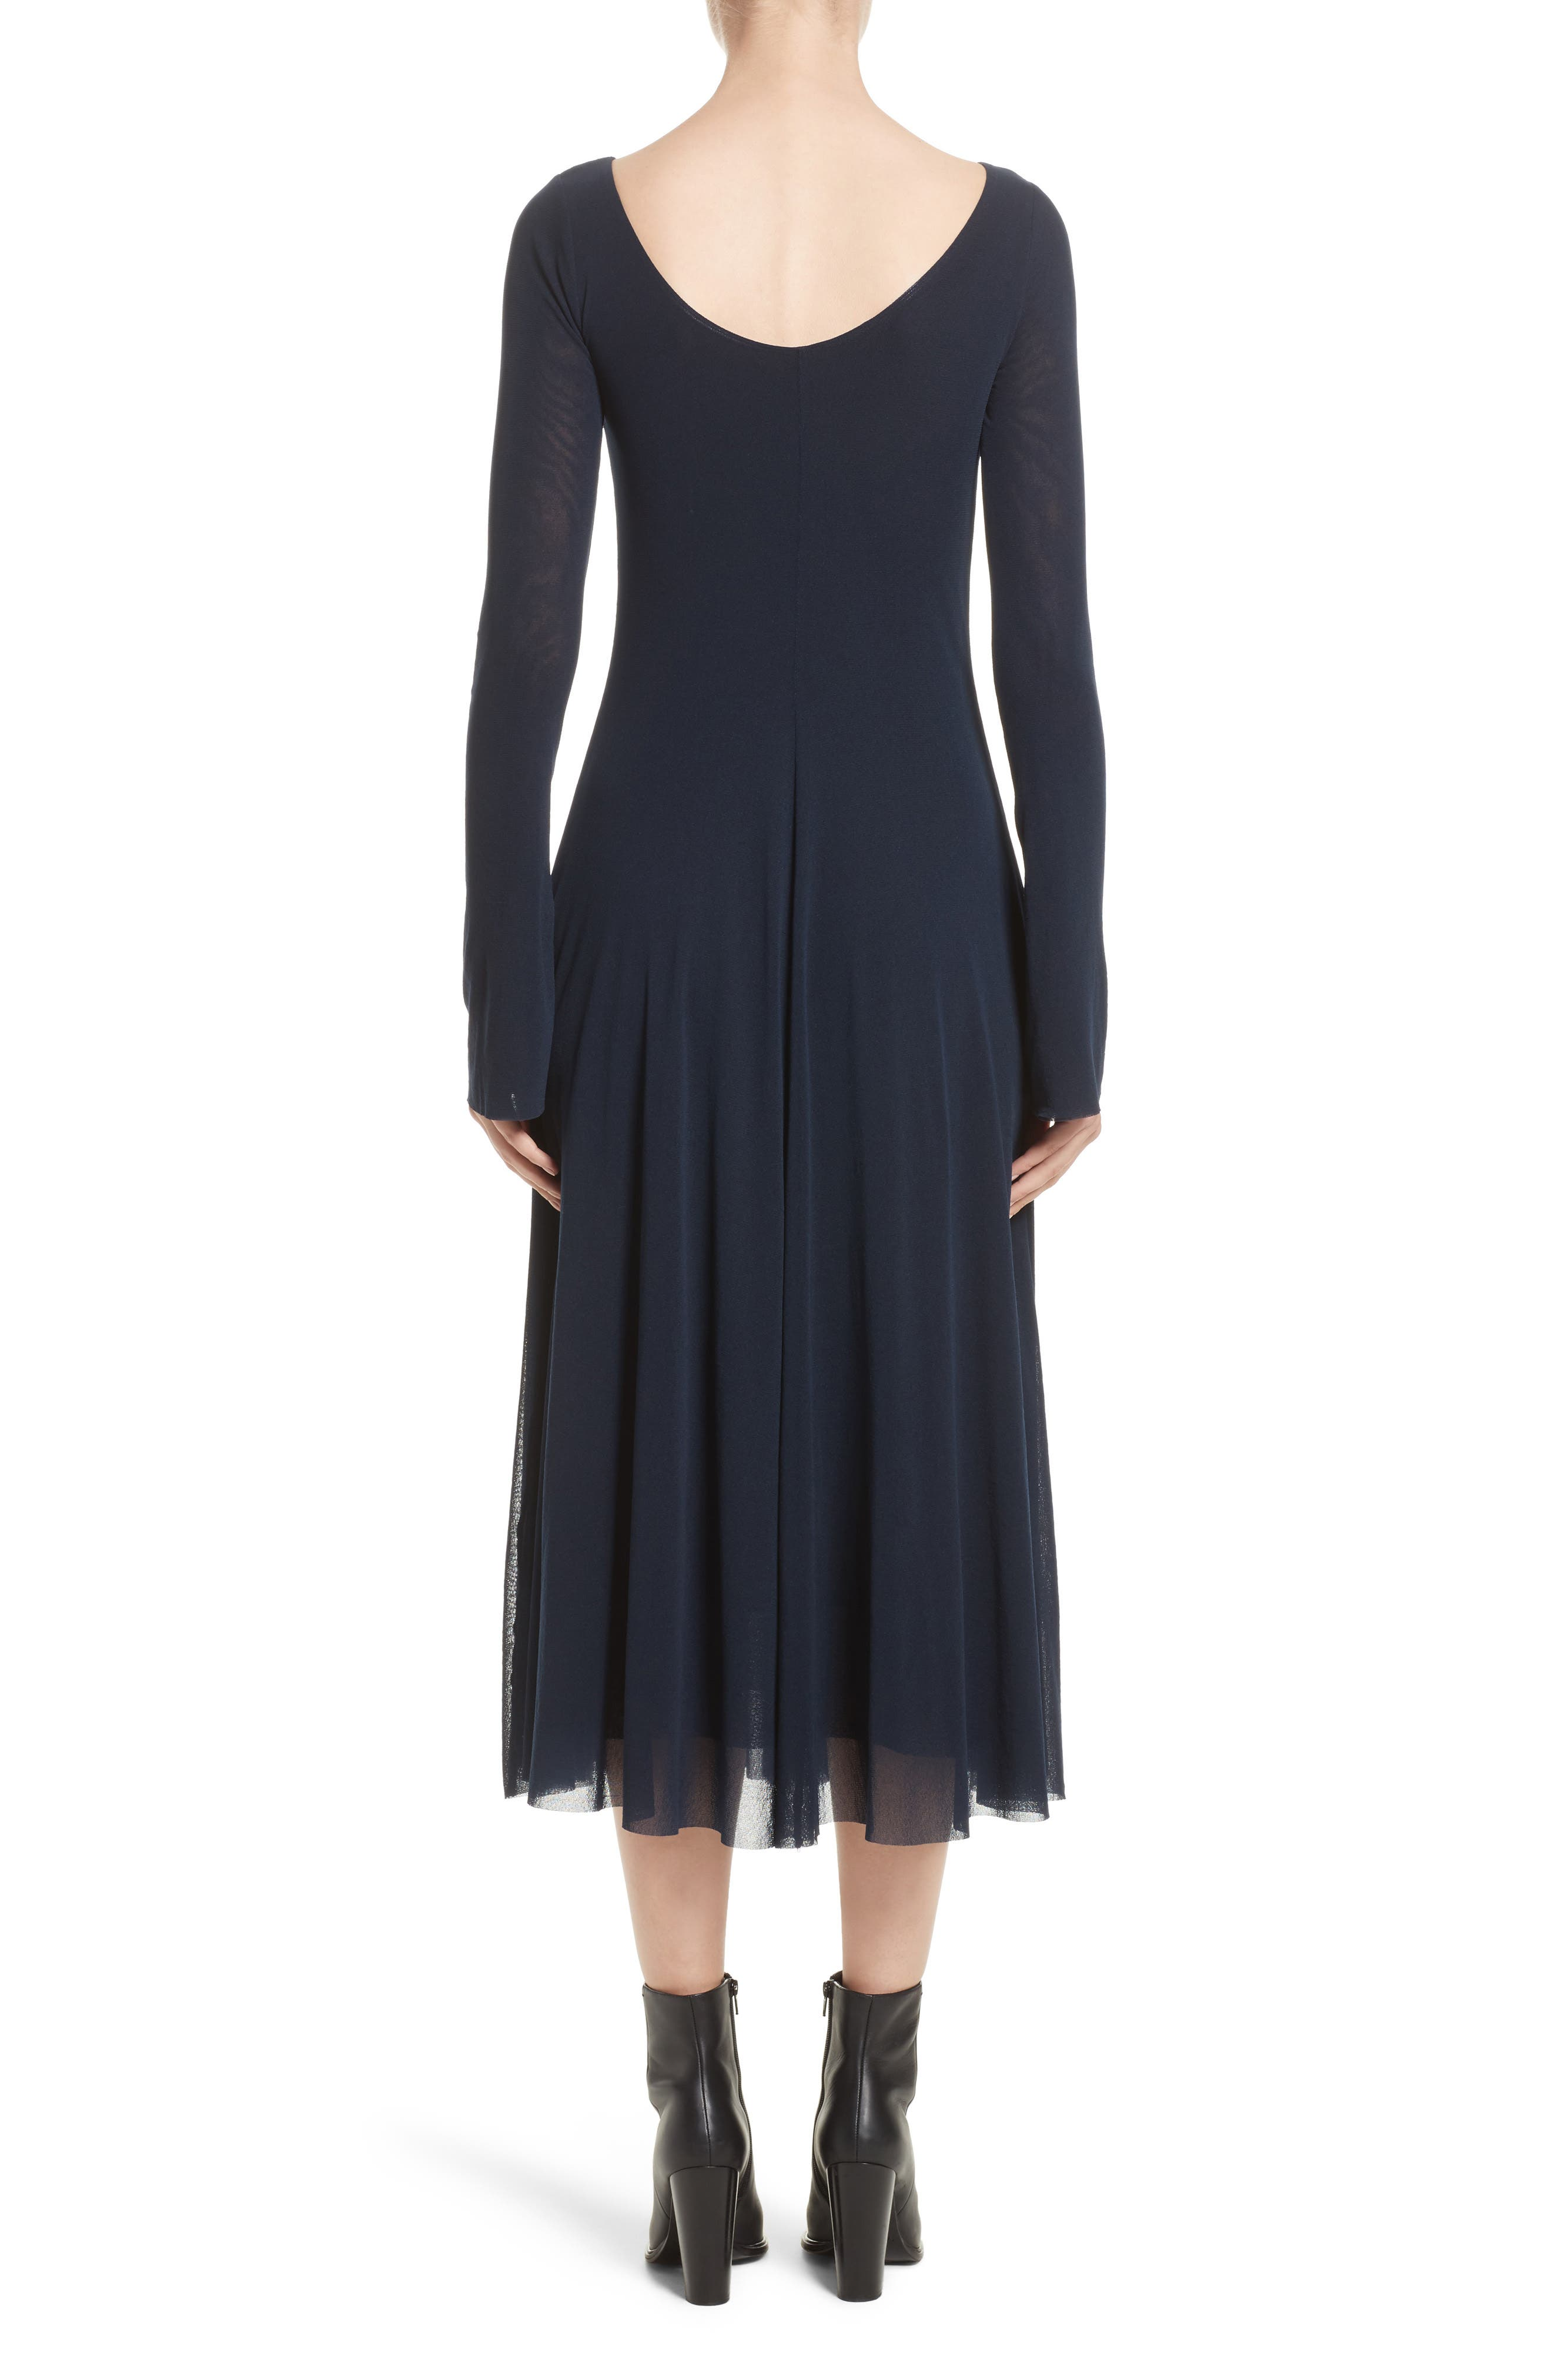 Reversible Tulle Dress,                             Alternate thumbnail 2, color,                             001